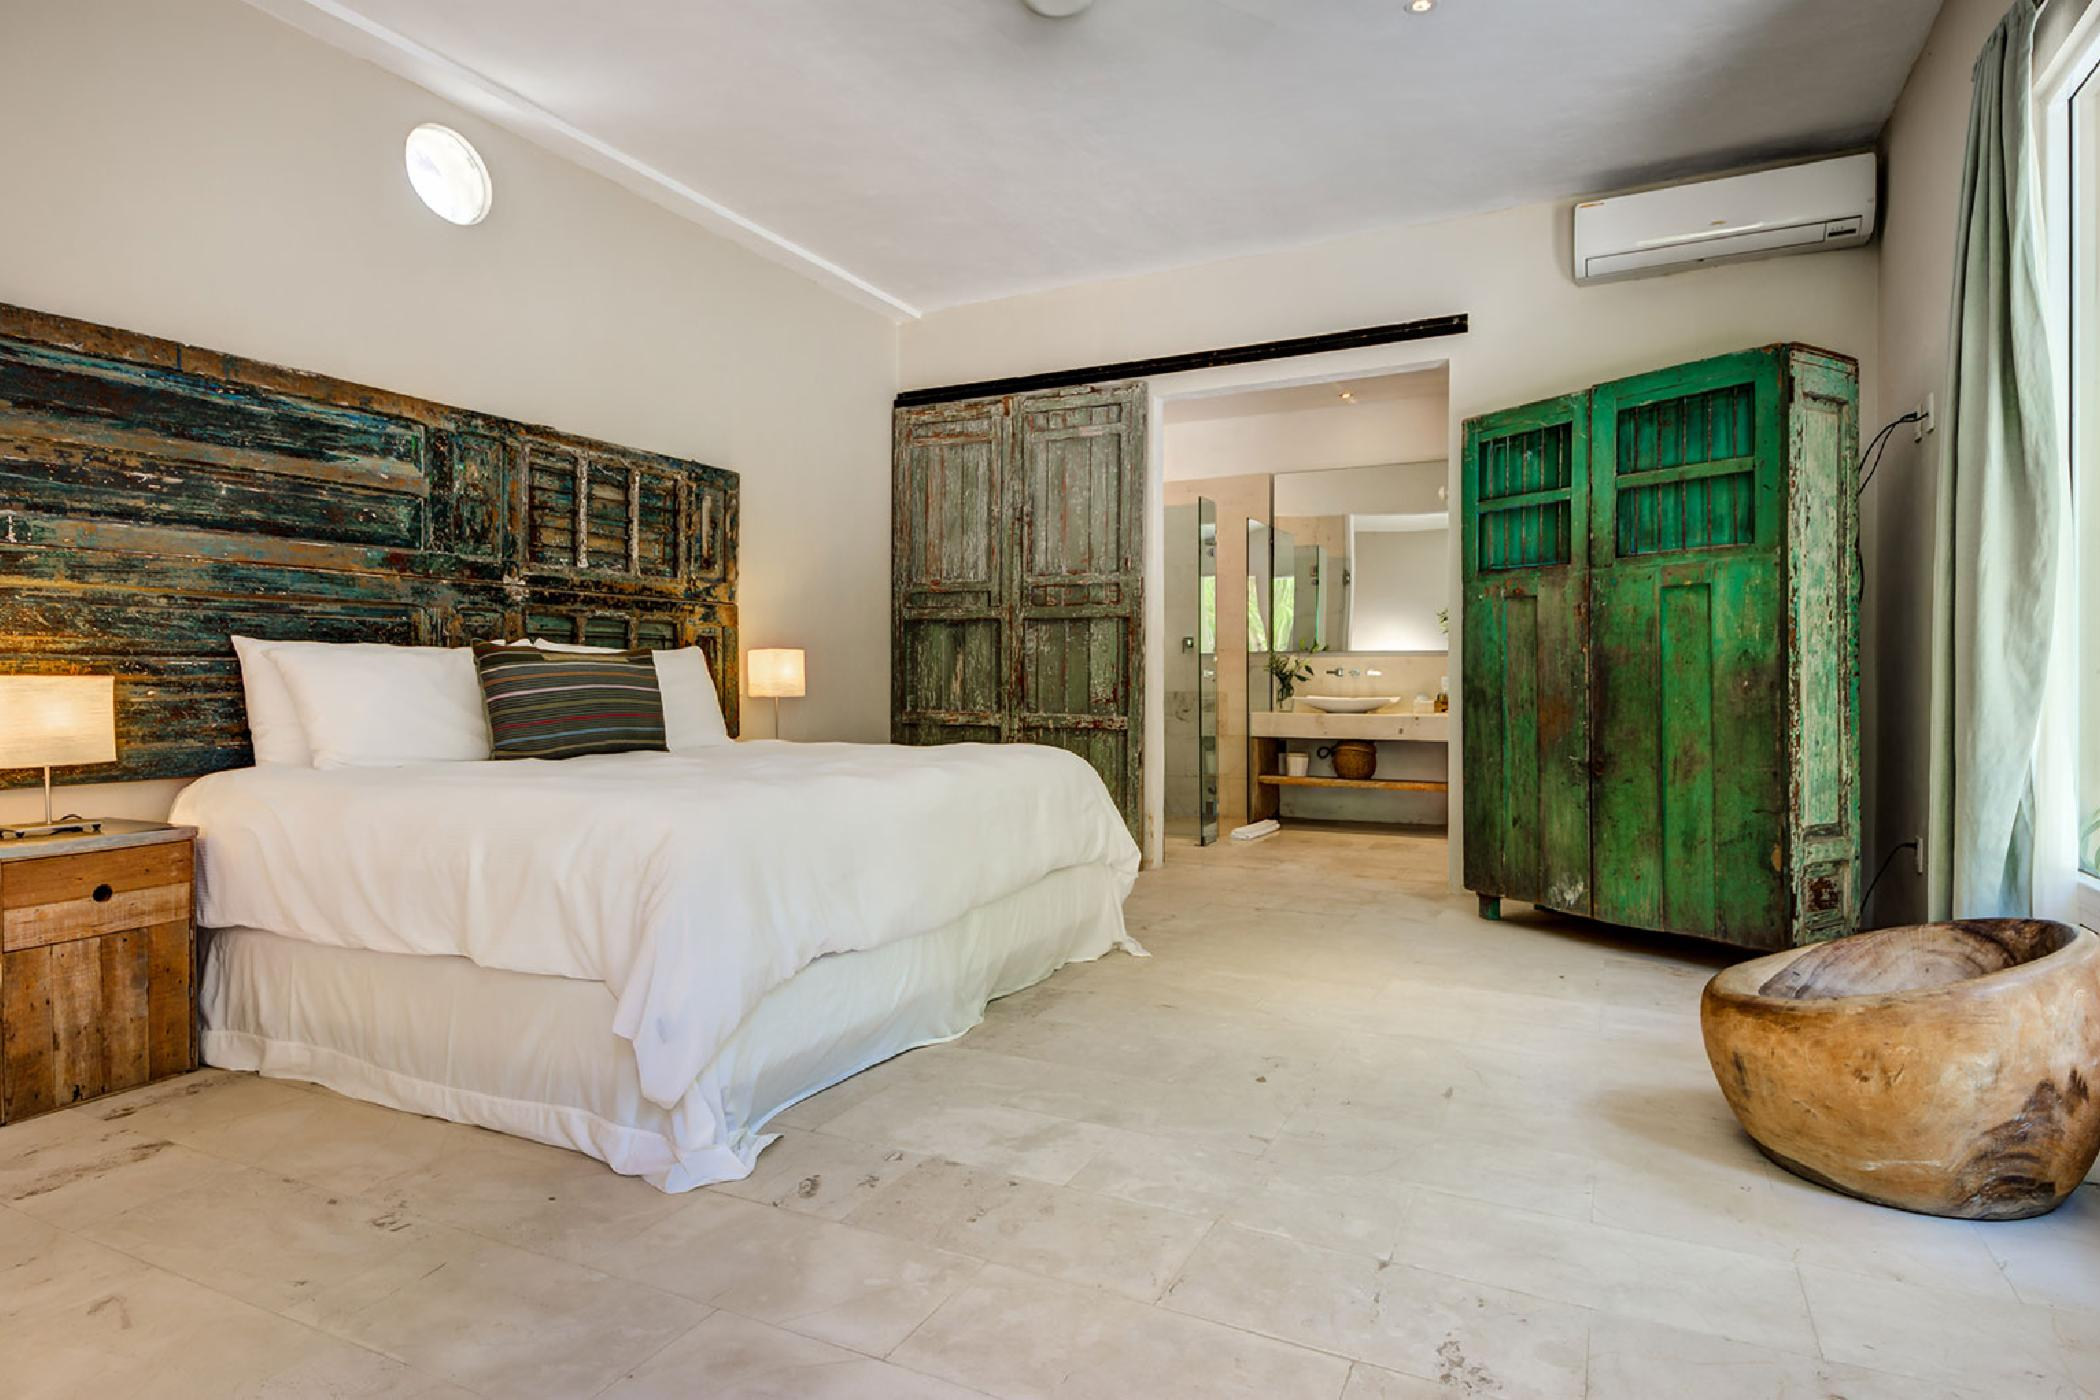 Maya_Luxe_Riviera_Maya_Luxury_Villas_Experiences_Puerto_Aventuras_5_Bedrooms_Zacil_Na_22.jpg